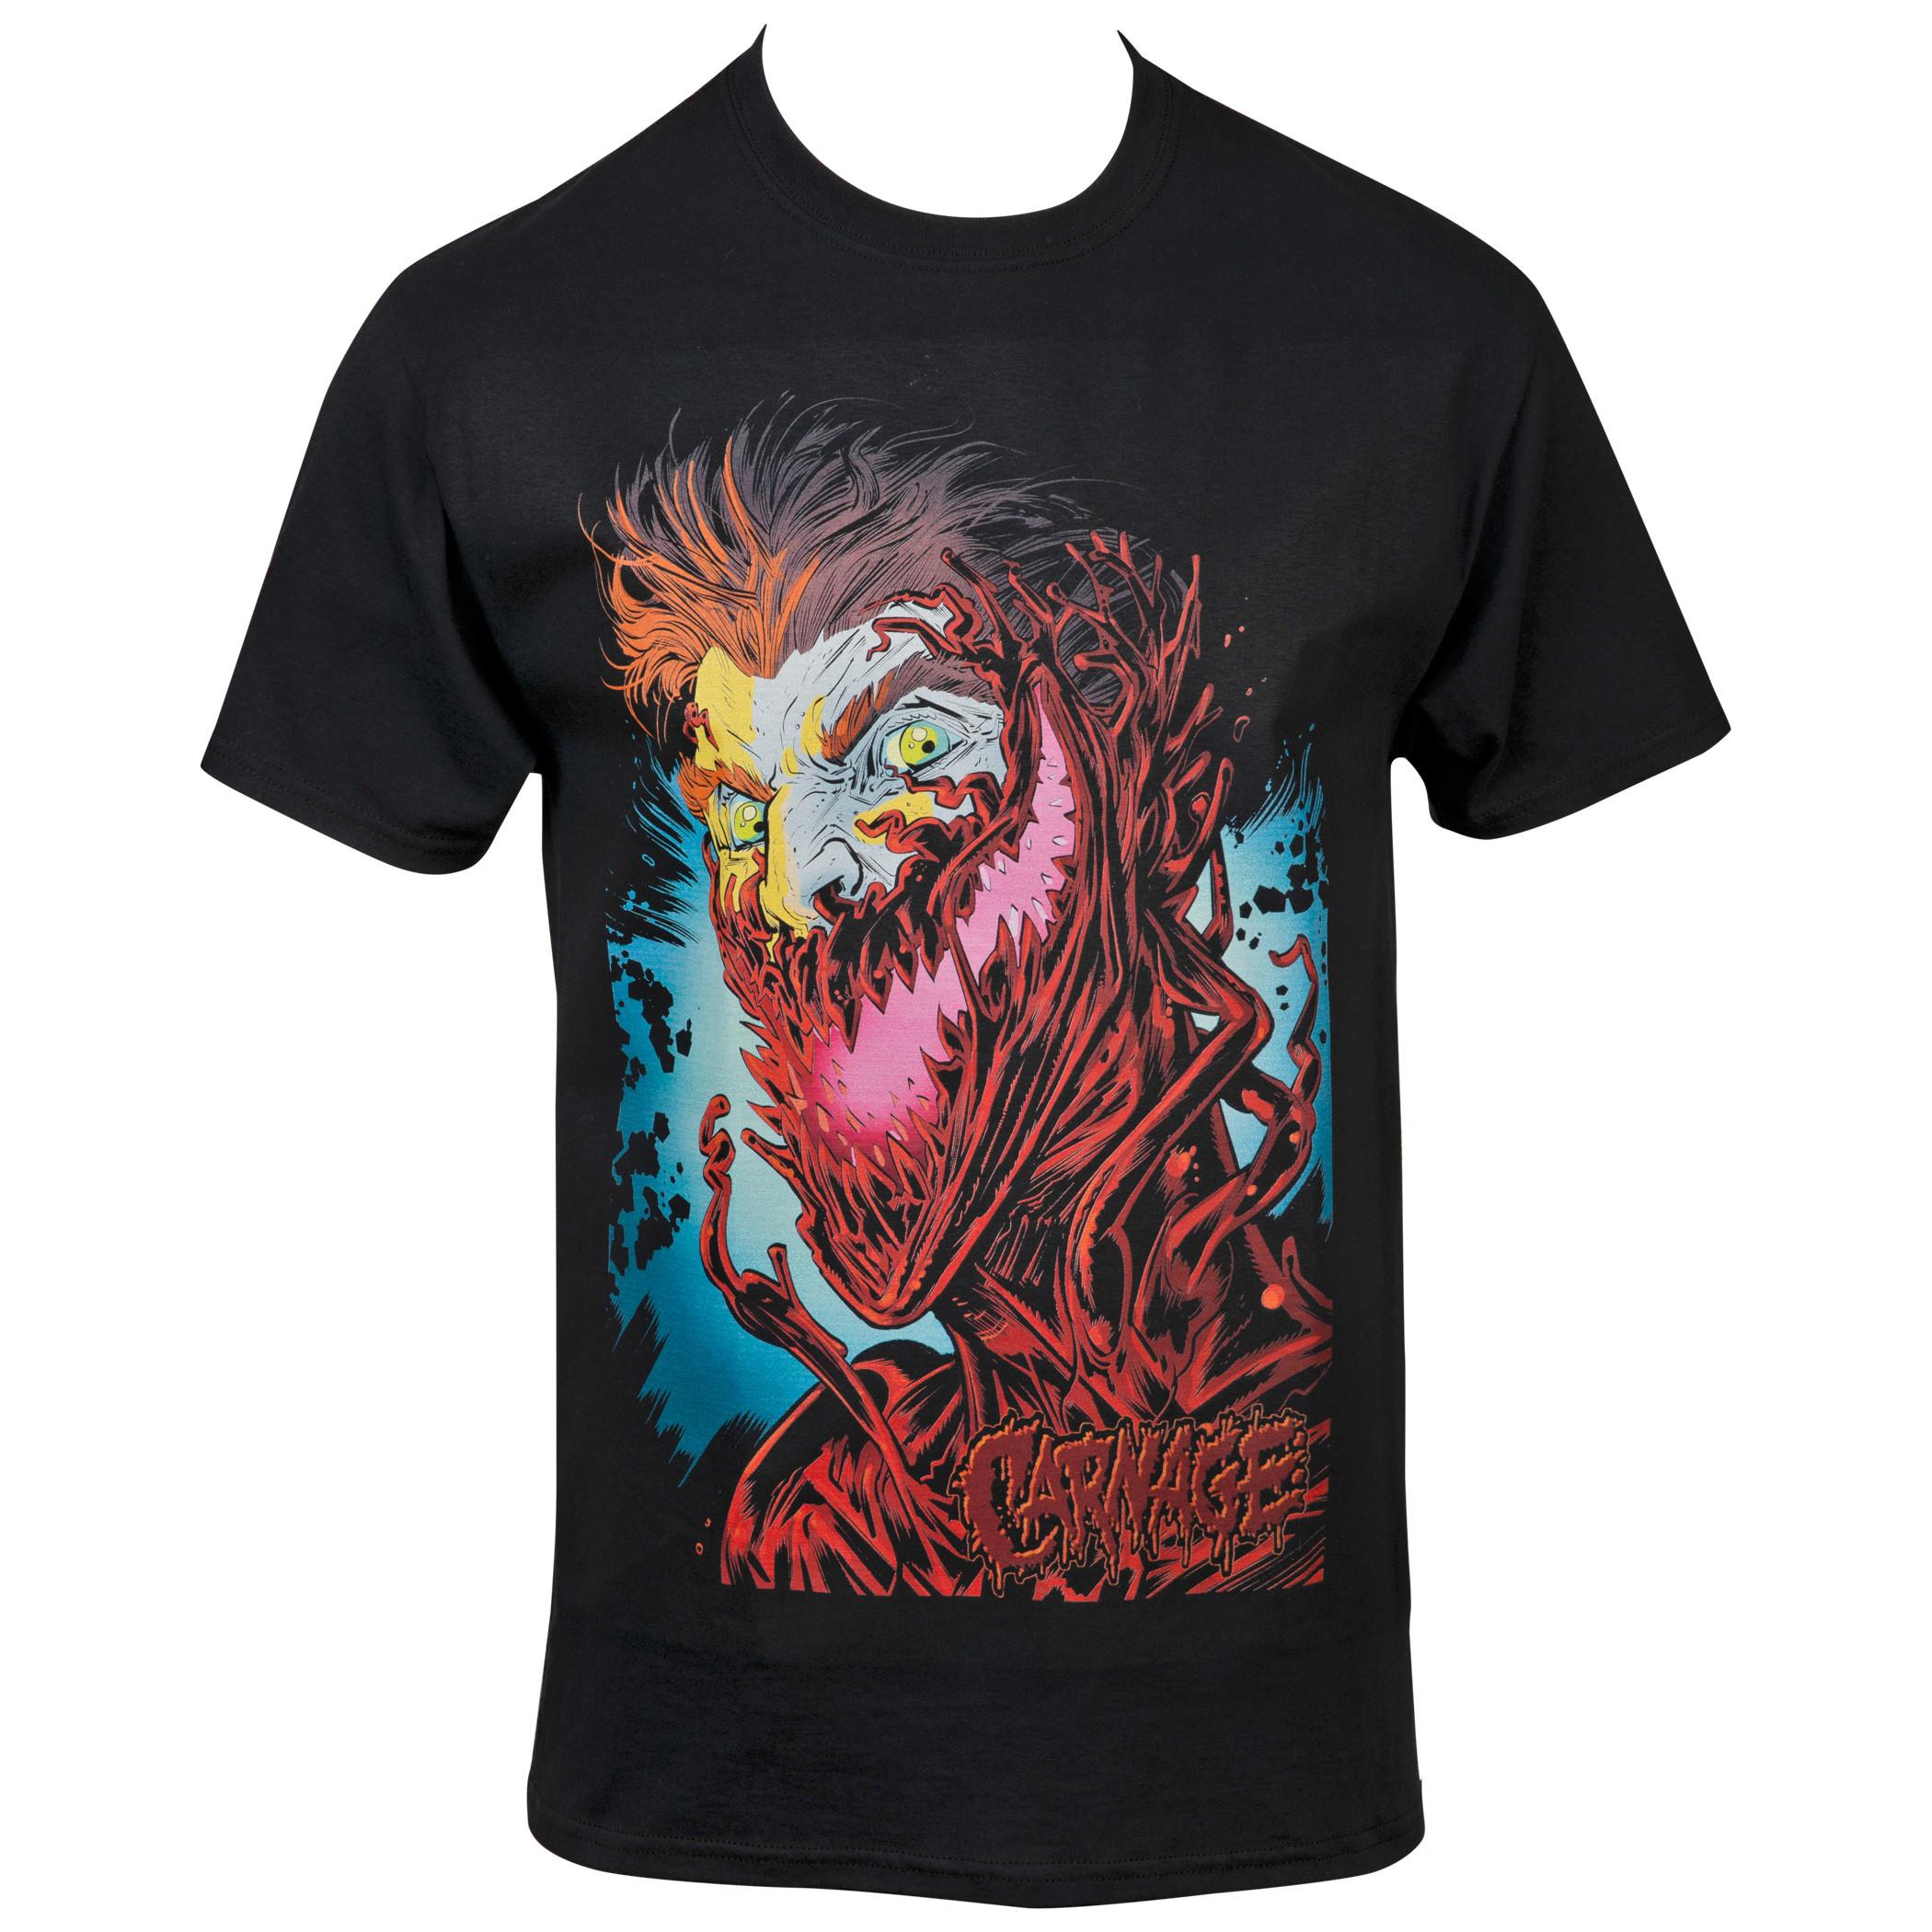 Marvel's Comics Carnage Cletus Cassidy Face T-Shirt